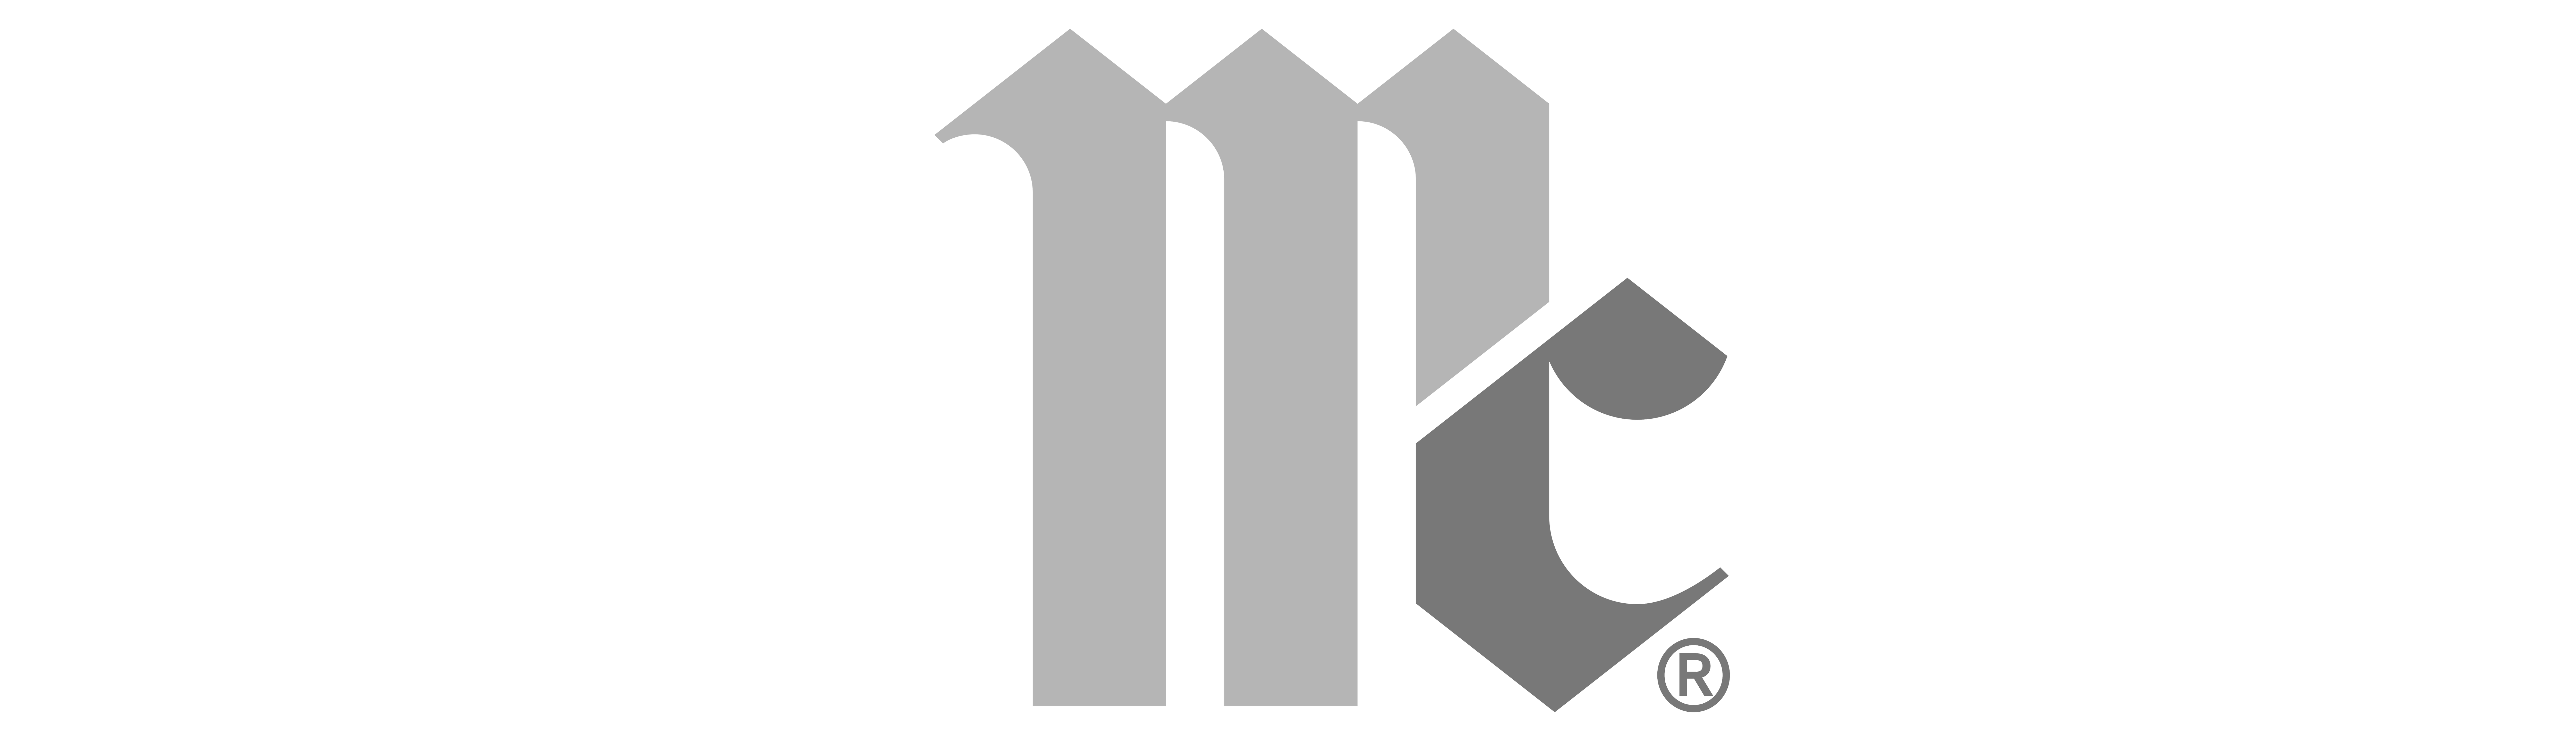 MKC logo